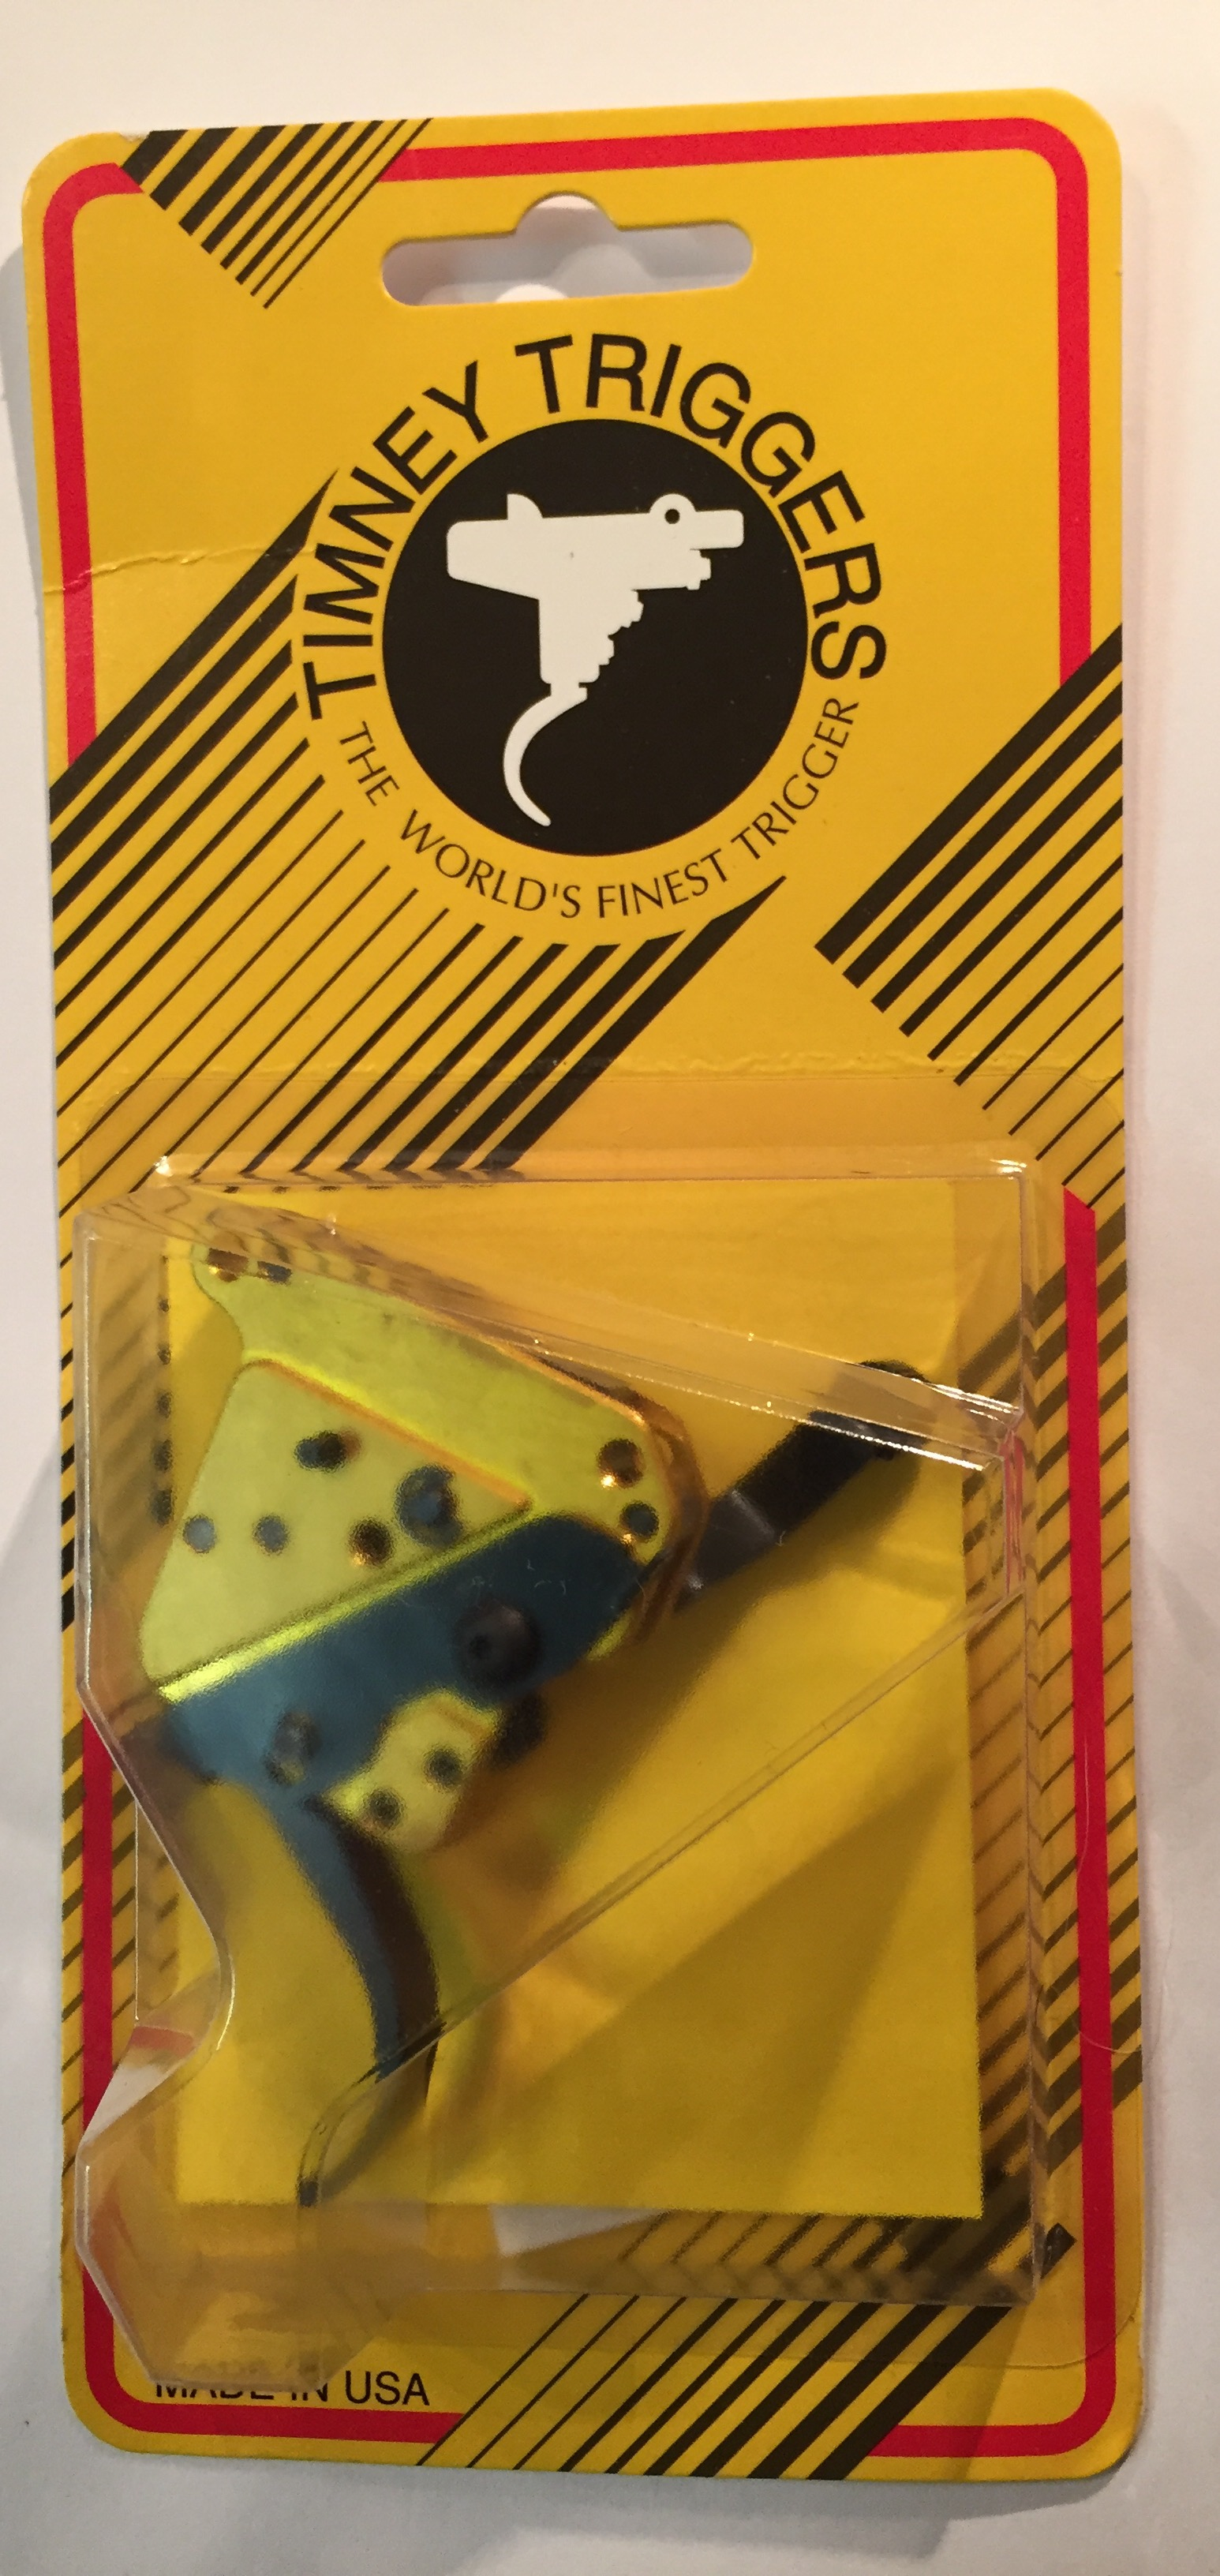 Timney Trigger #520-CE for Remington 700 721 722 Calvin Elite 8oz-2 5lbs  Adjustable